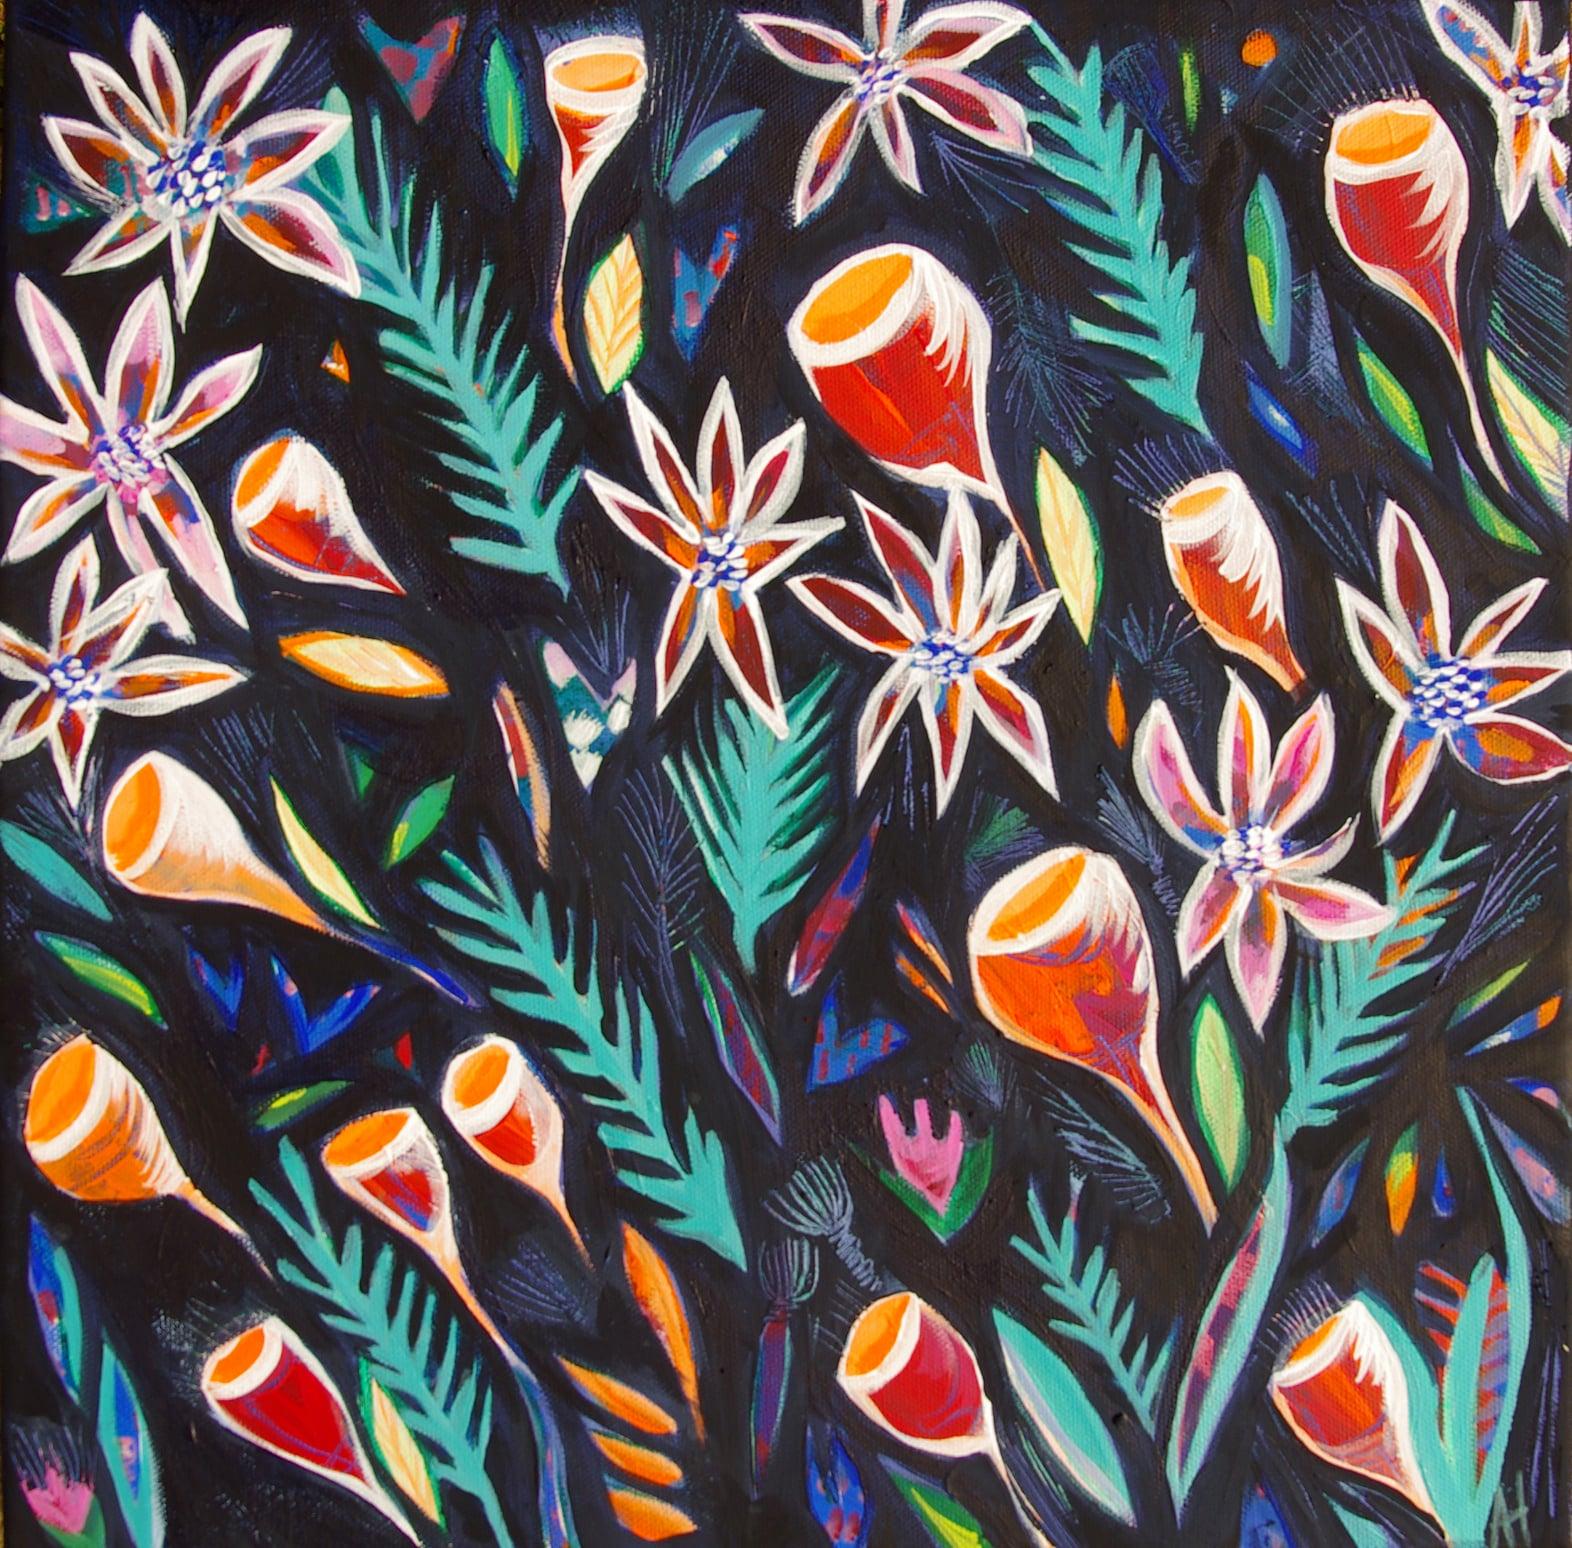 'Stormflowers at Night' 40x40cm Acrylic on Canvas